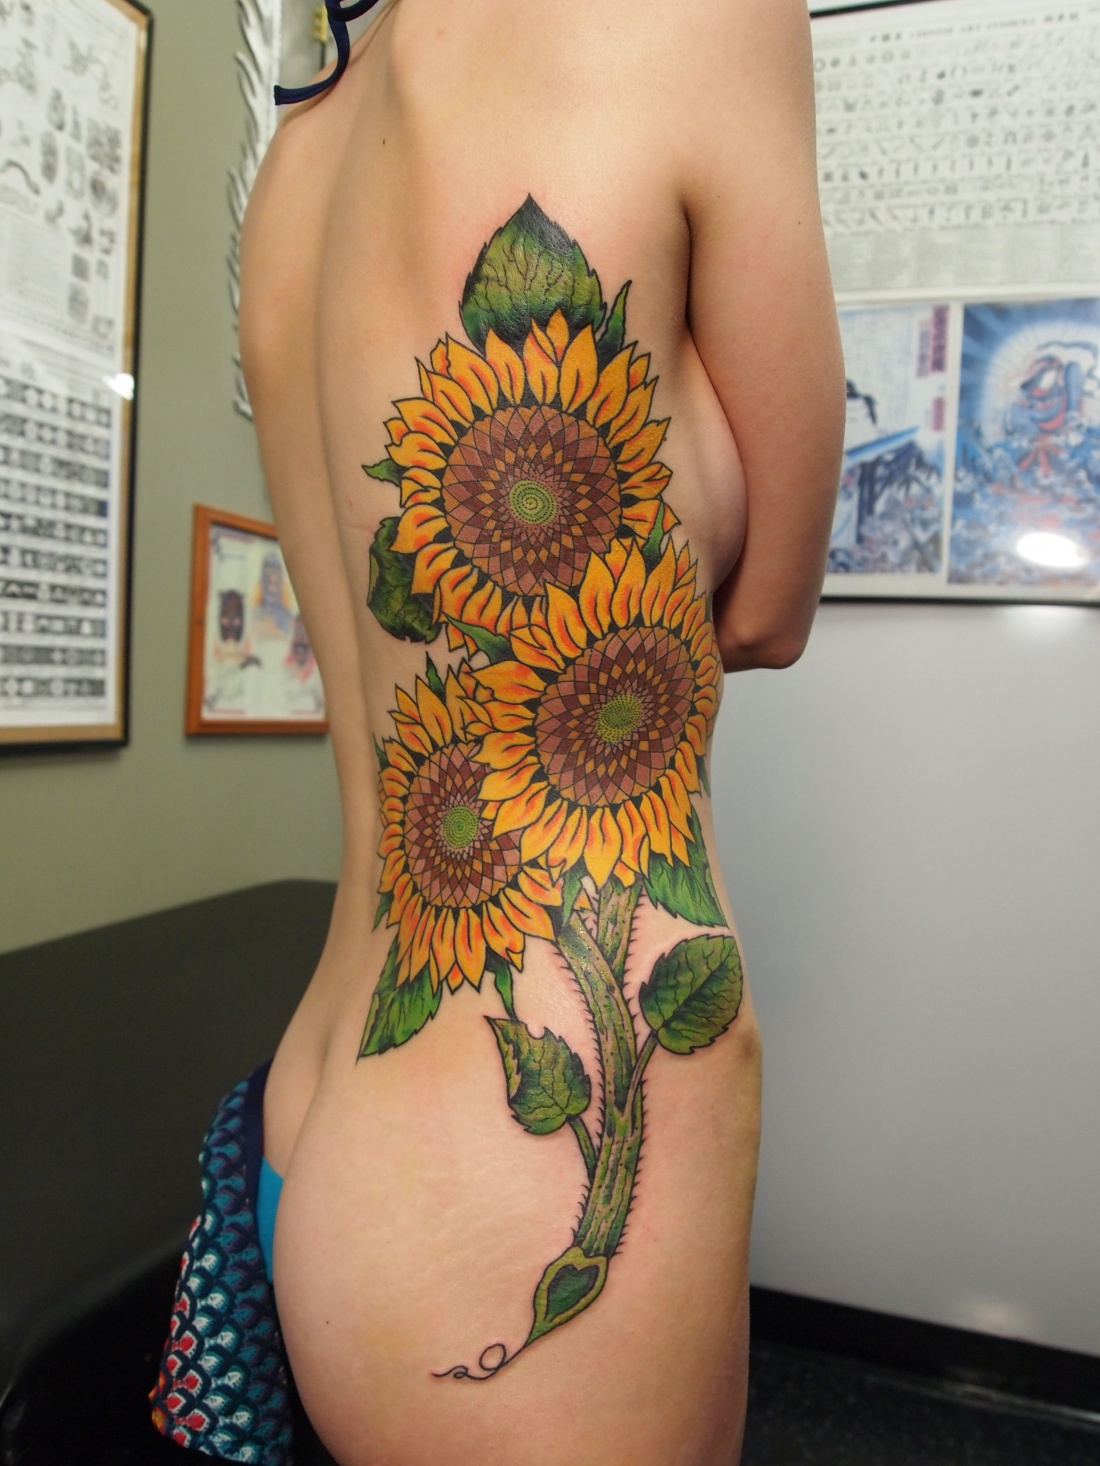 April 26 2012 Iron Brush Tattoo